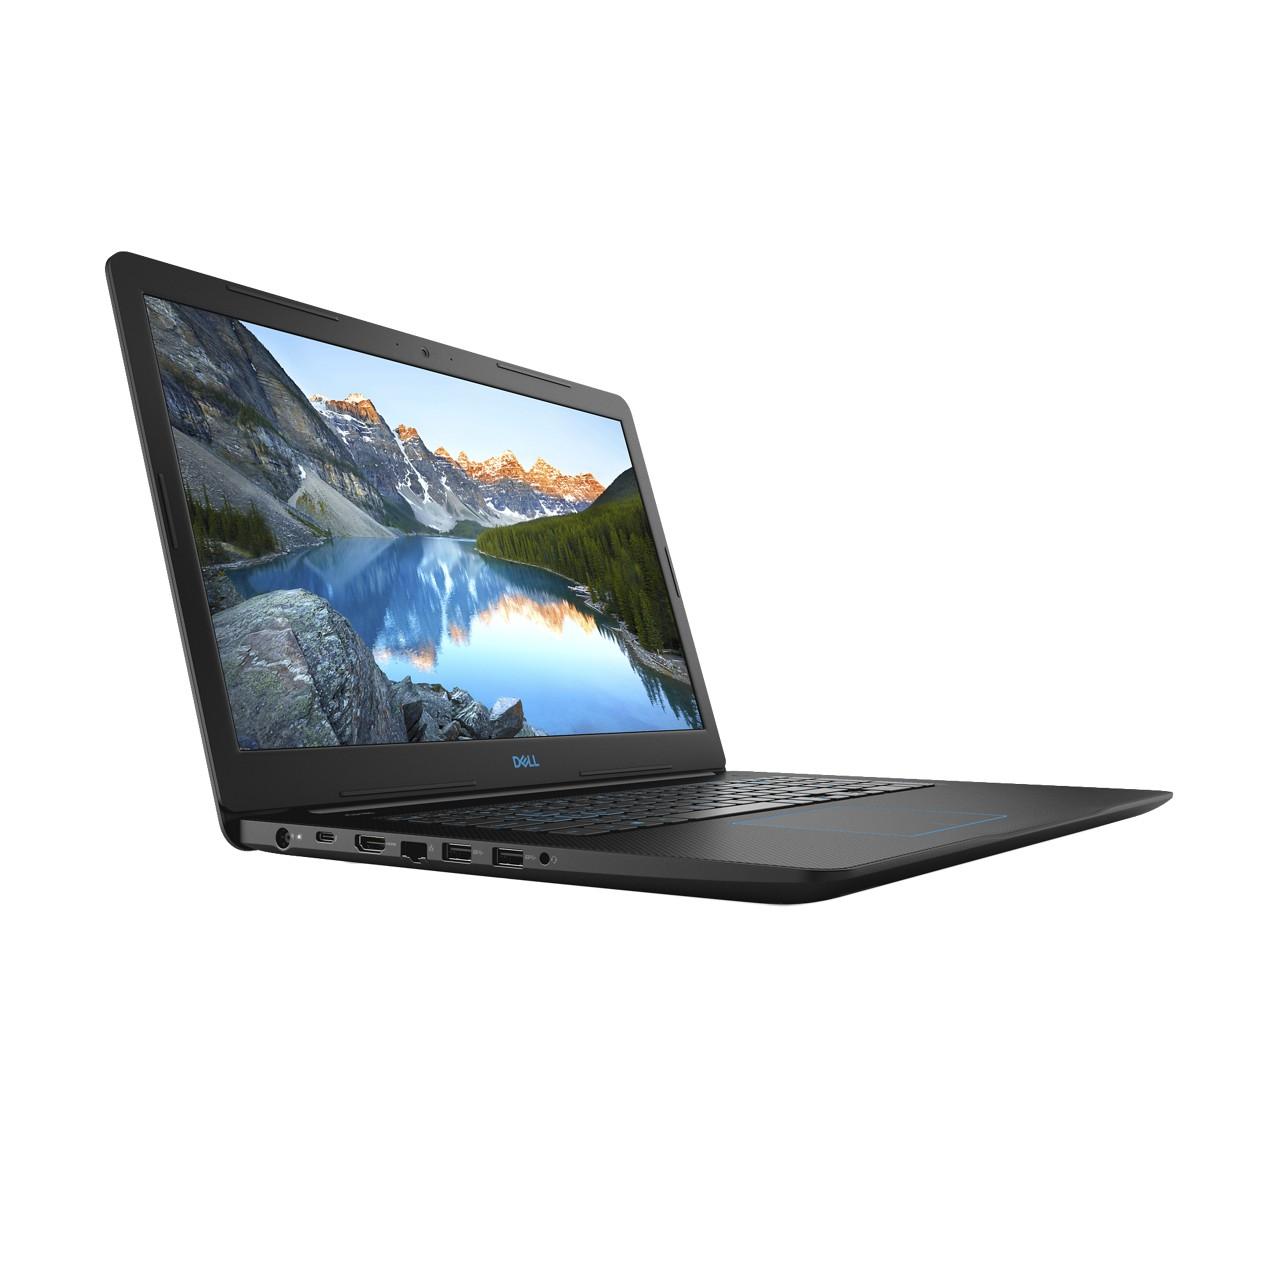 Dell G Series G3 17 Gaming 17.3